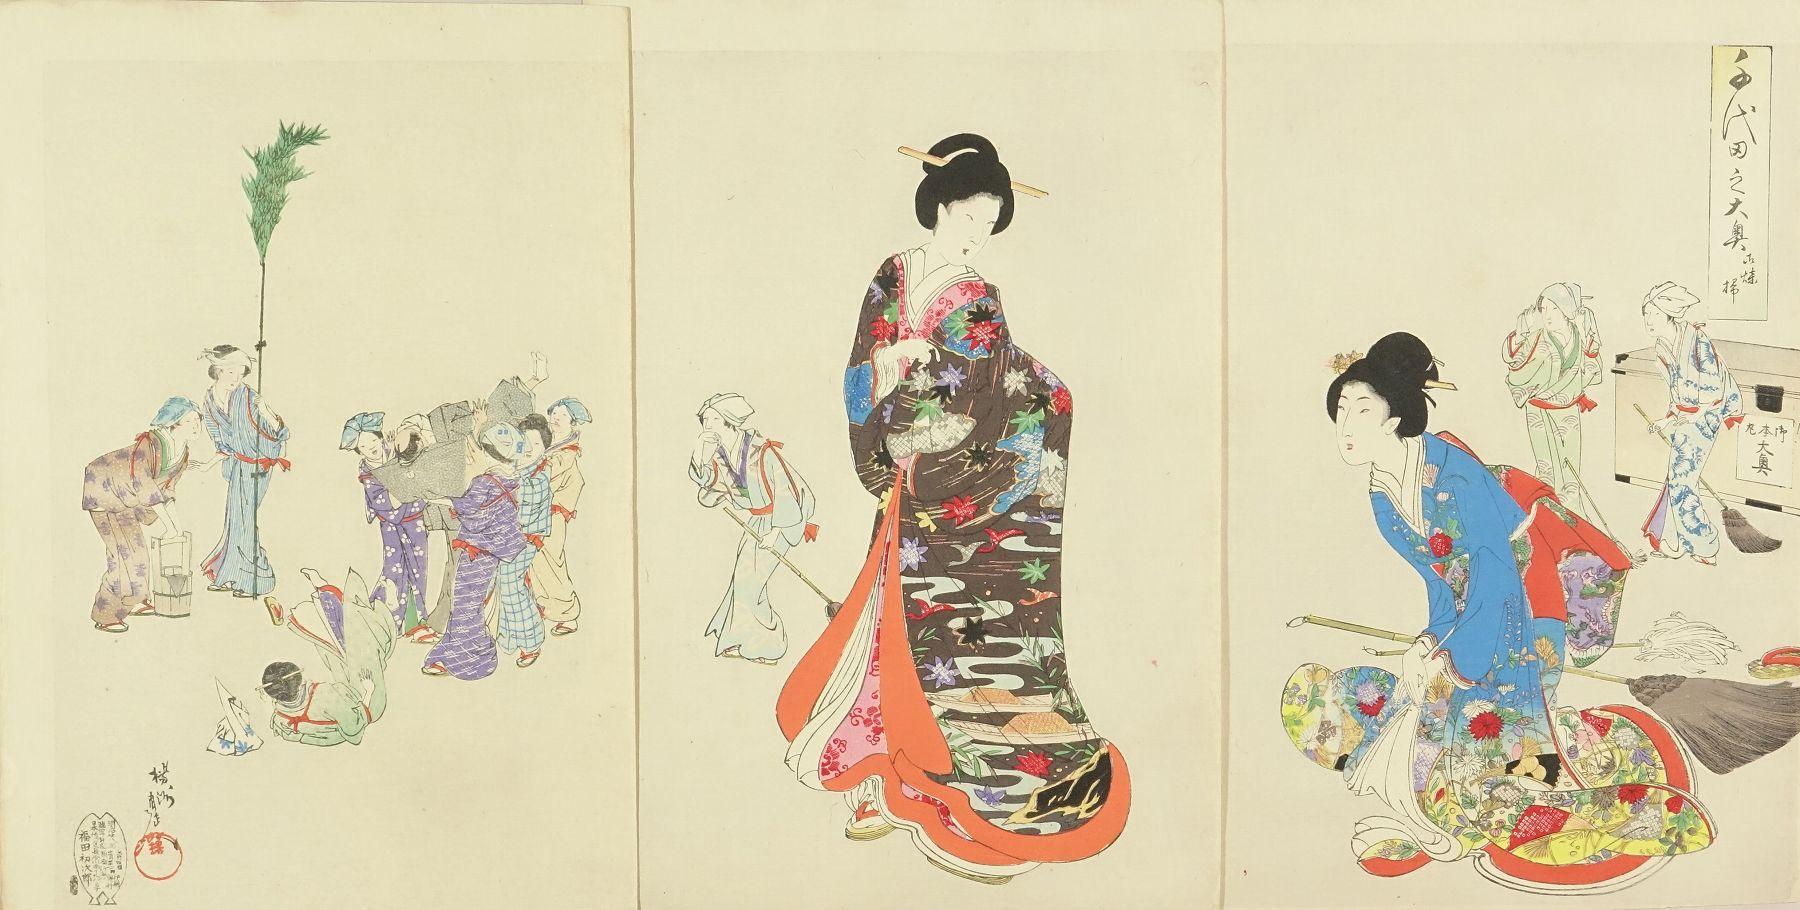 CHIKANOBU <i>O-susu harai</i> (House cleaning), from <i>Chiyoda no o-oku</i> (Inner palace of Edo Castle), triptych